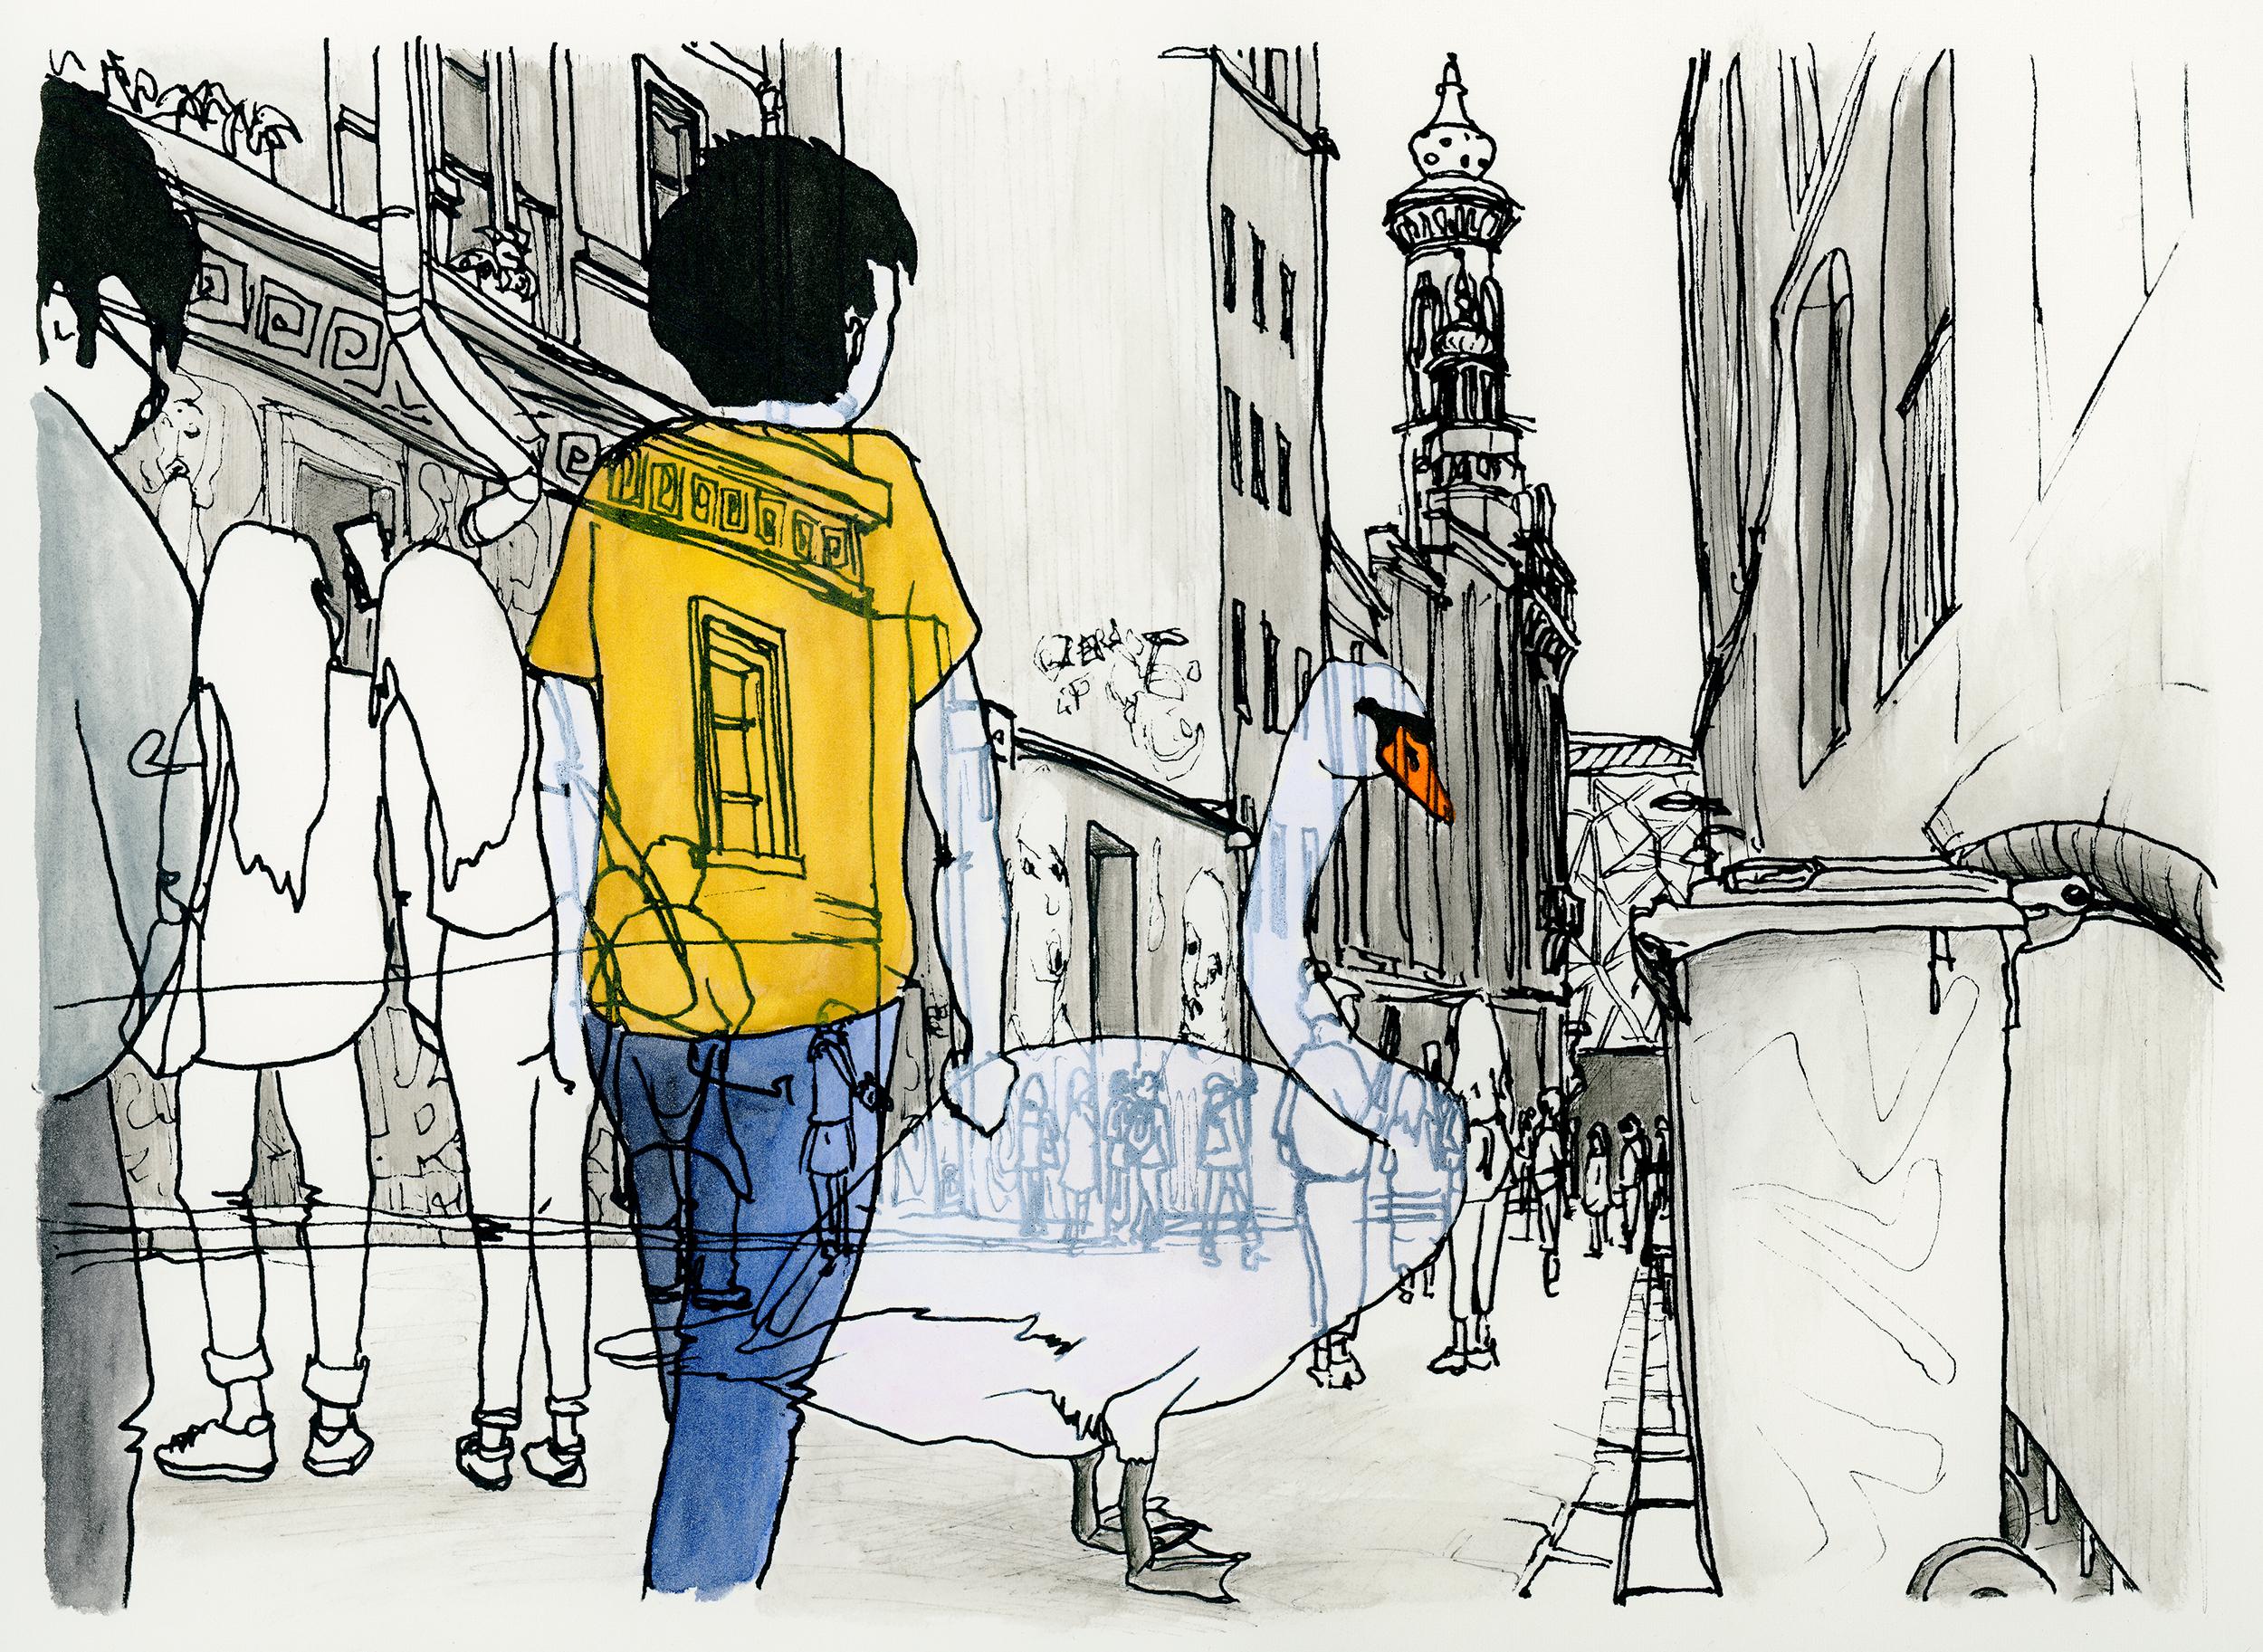 STREET ARTIST. - SMALL.jpg